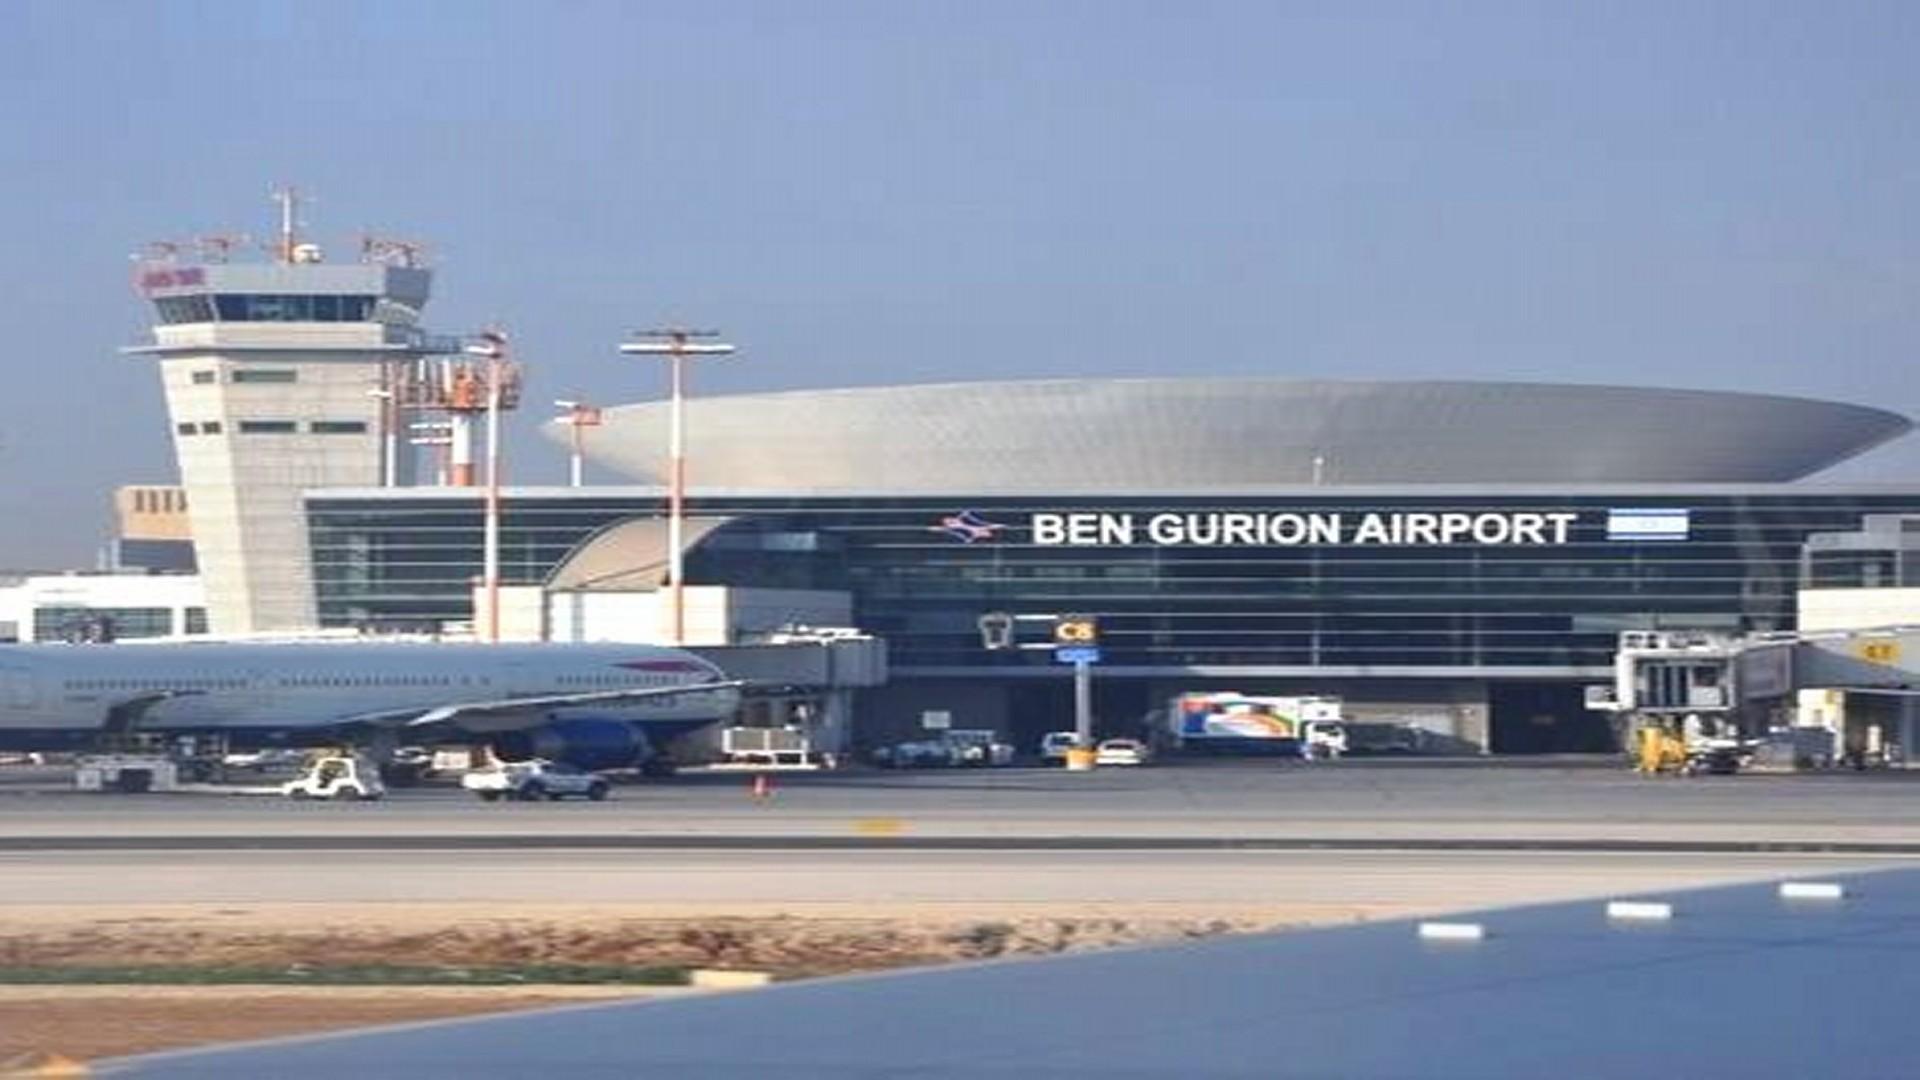 Купить билет на самолет в аэропорту бен гурион сколько стоит билет на самолет до татарстана